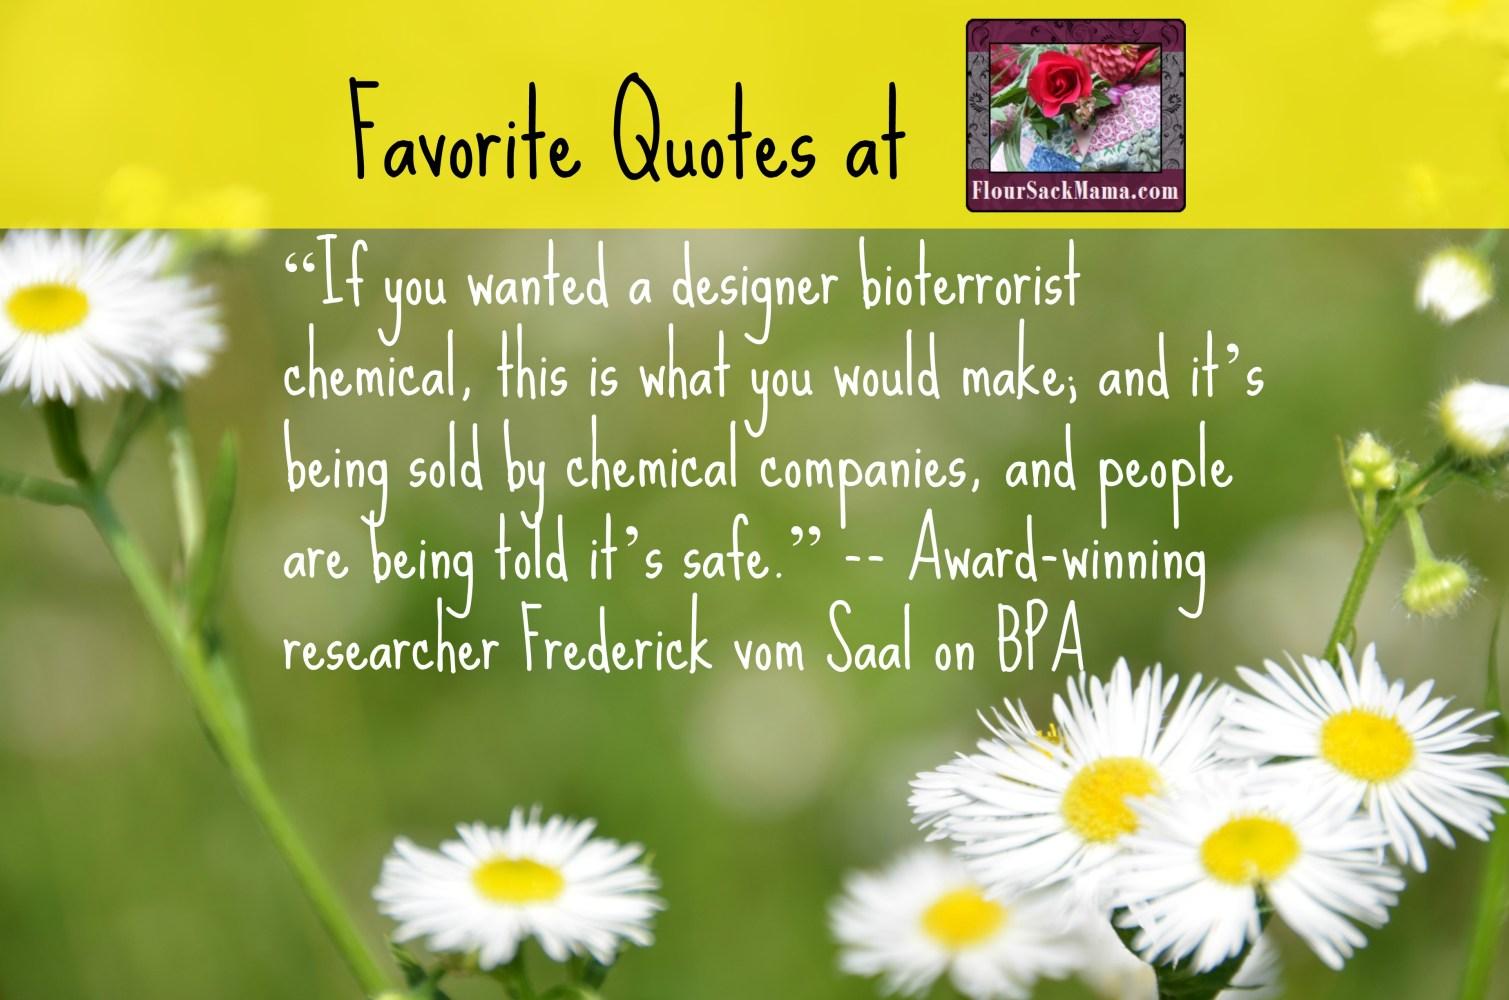 Quote vom Saal FlourSackMama